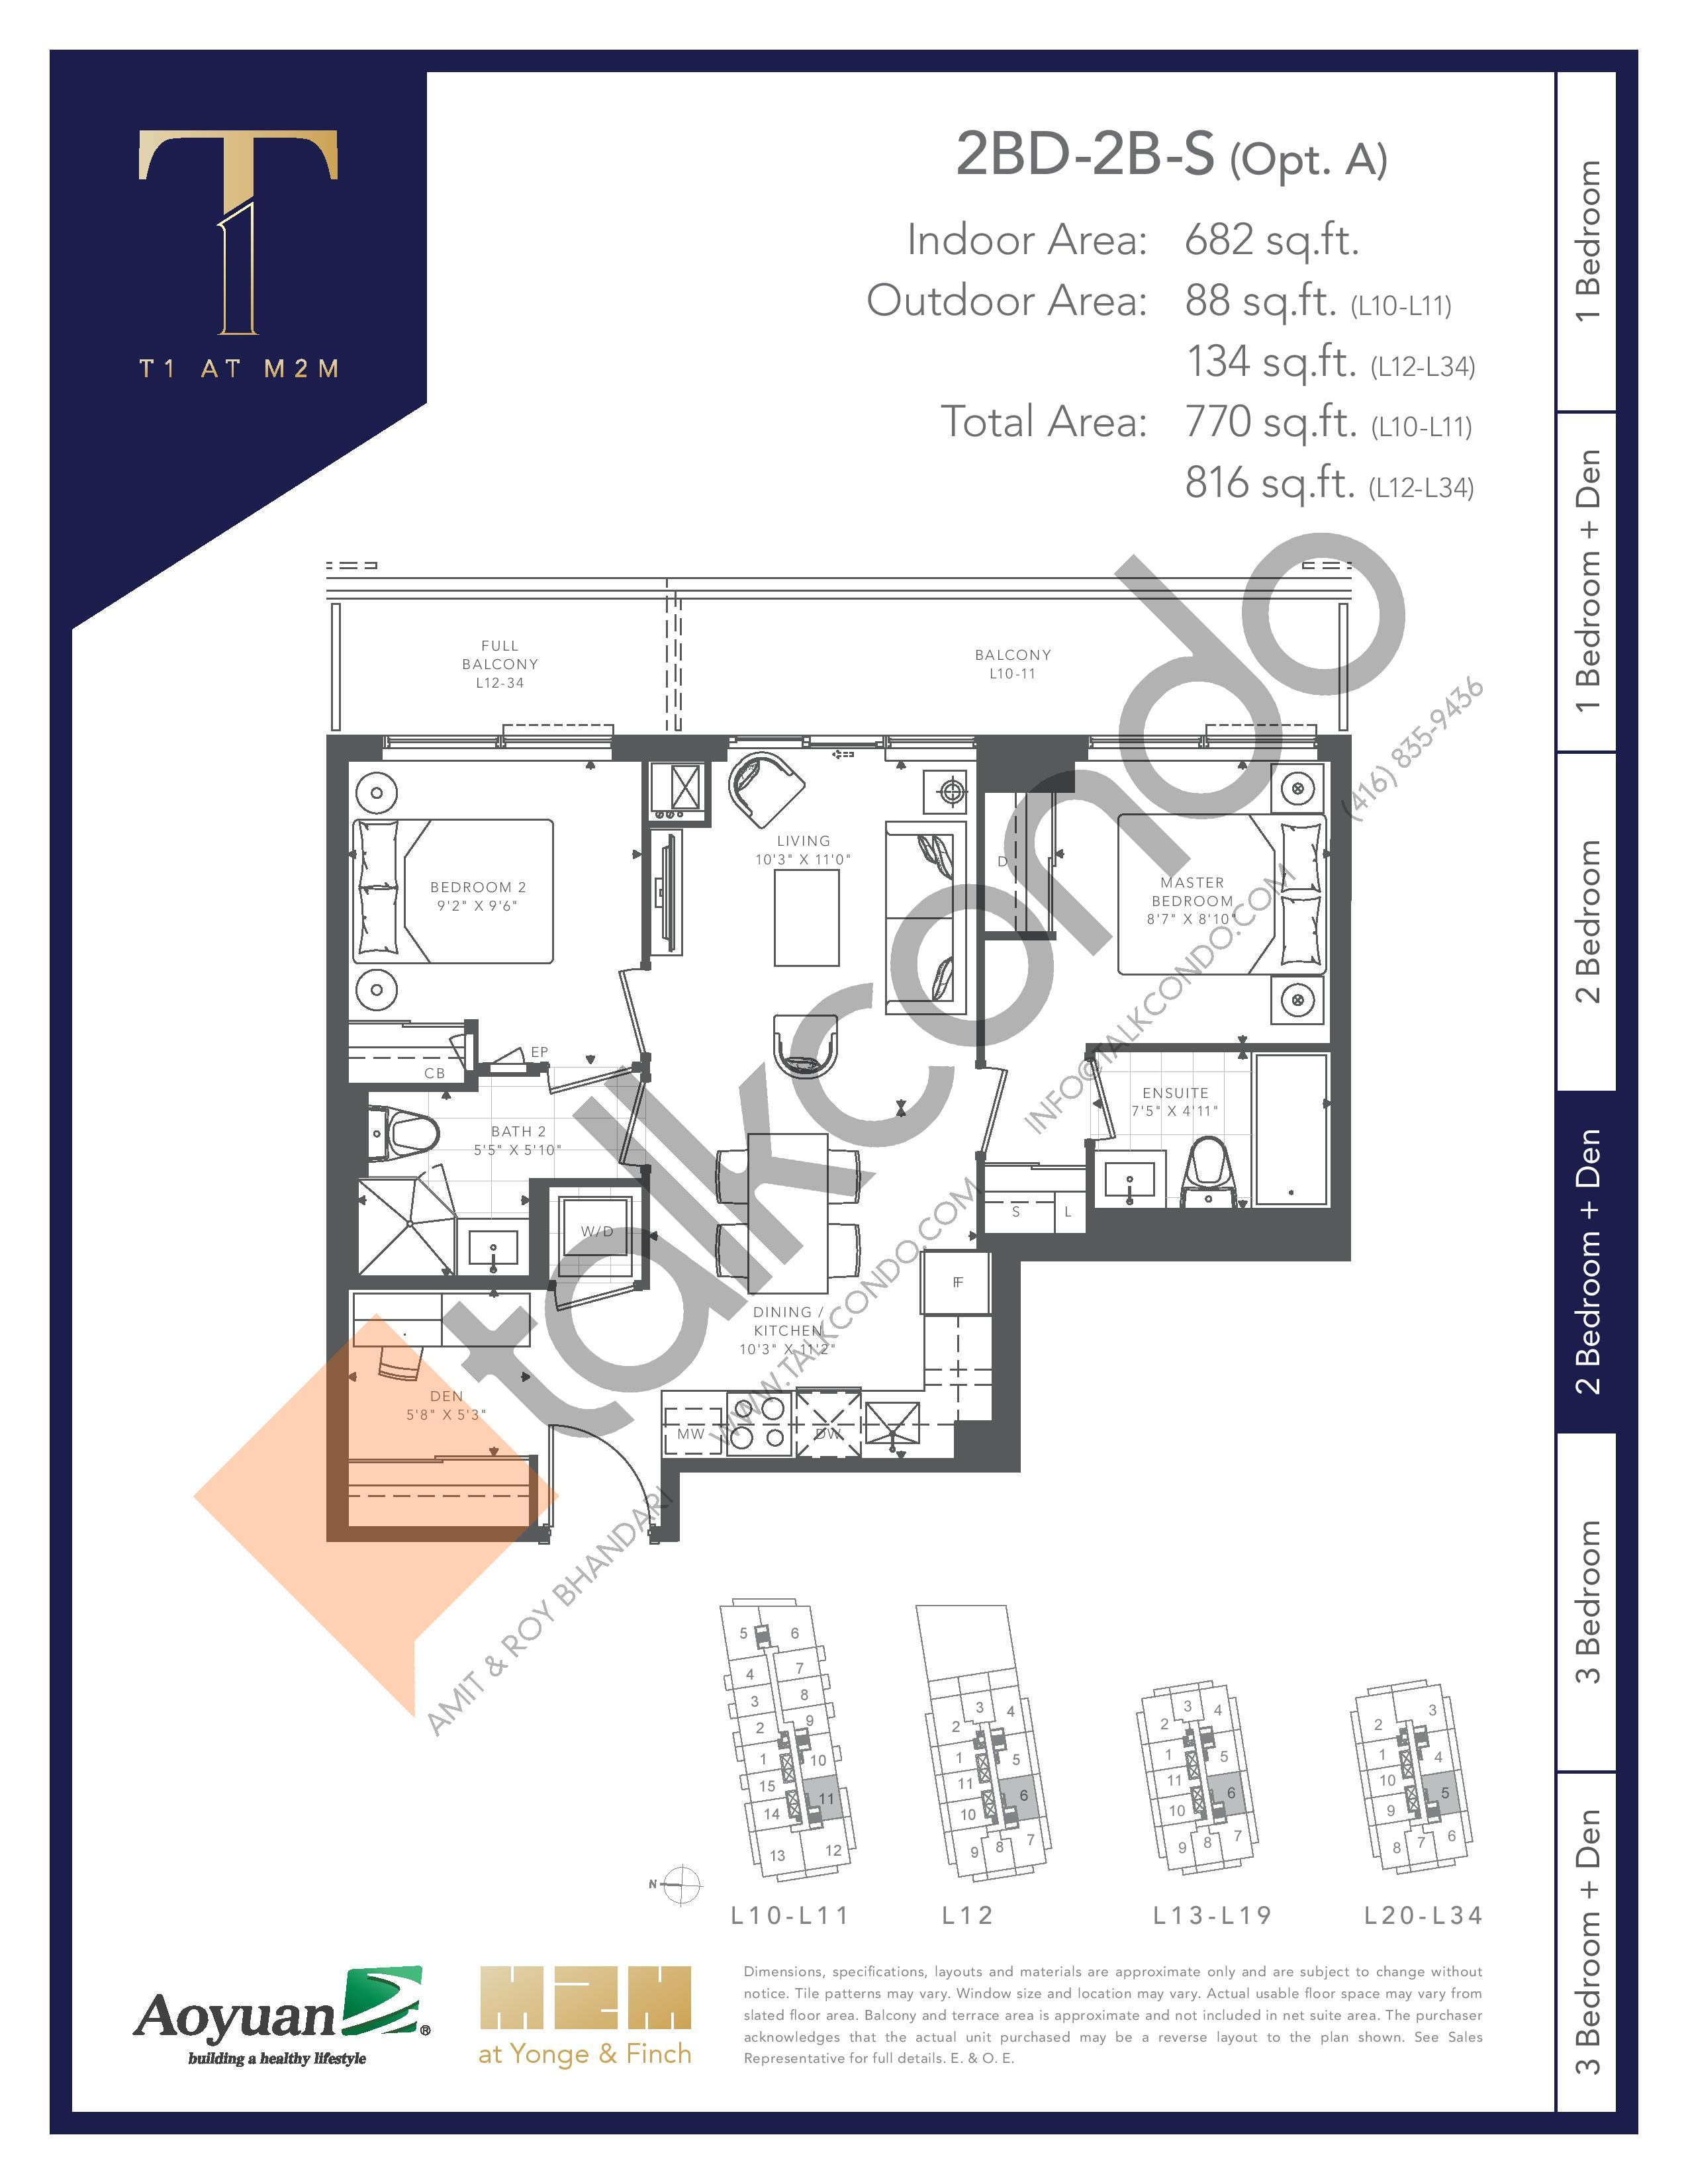 2BD-2B-S (Opt. A) Floor Plan at T1 at M2M Condos - 682 sq.ft